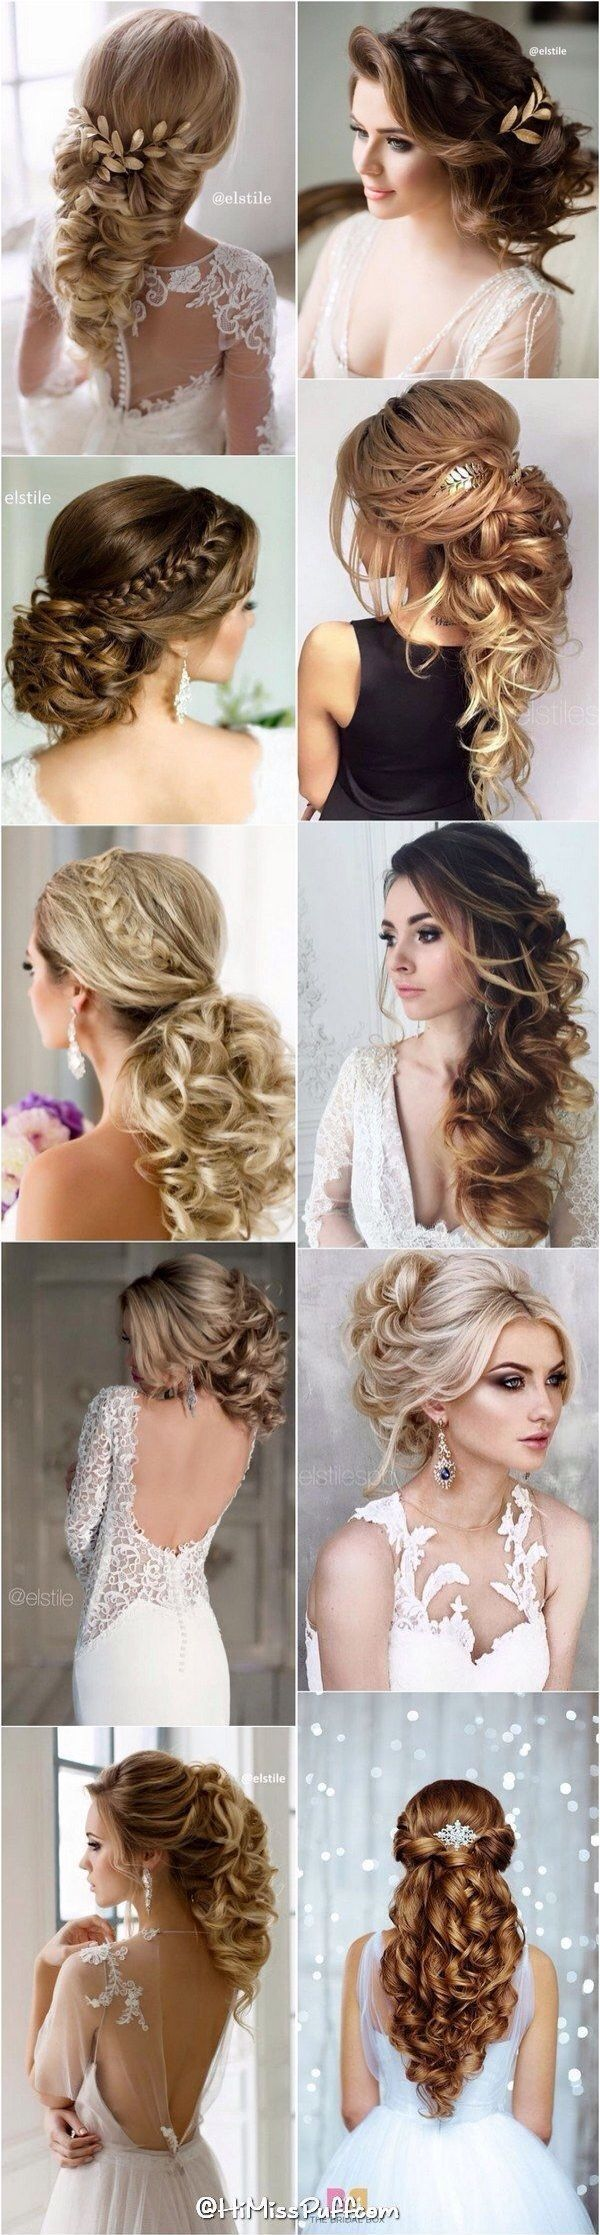 Ammazing hairstyles